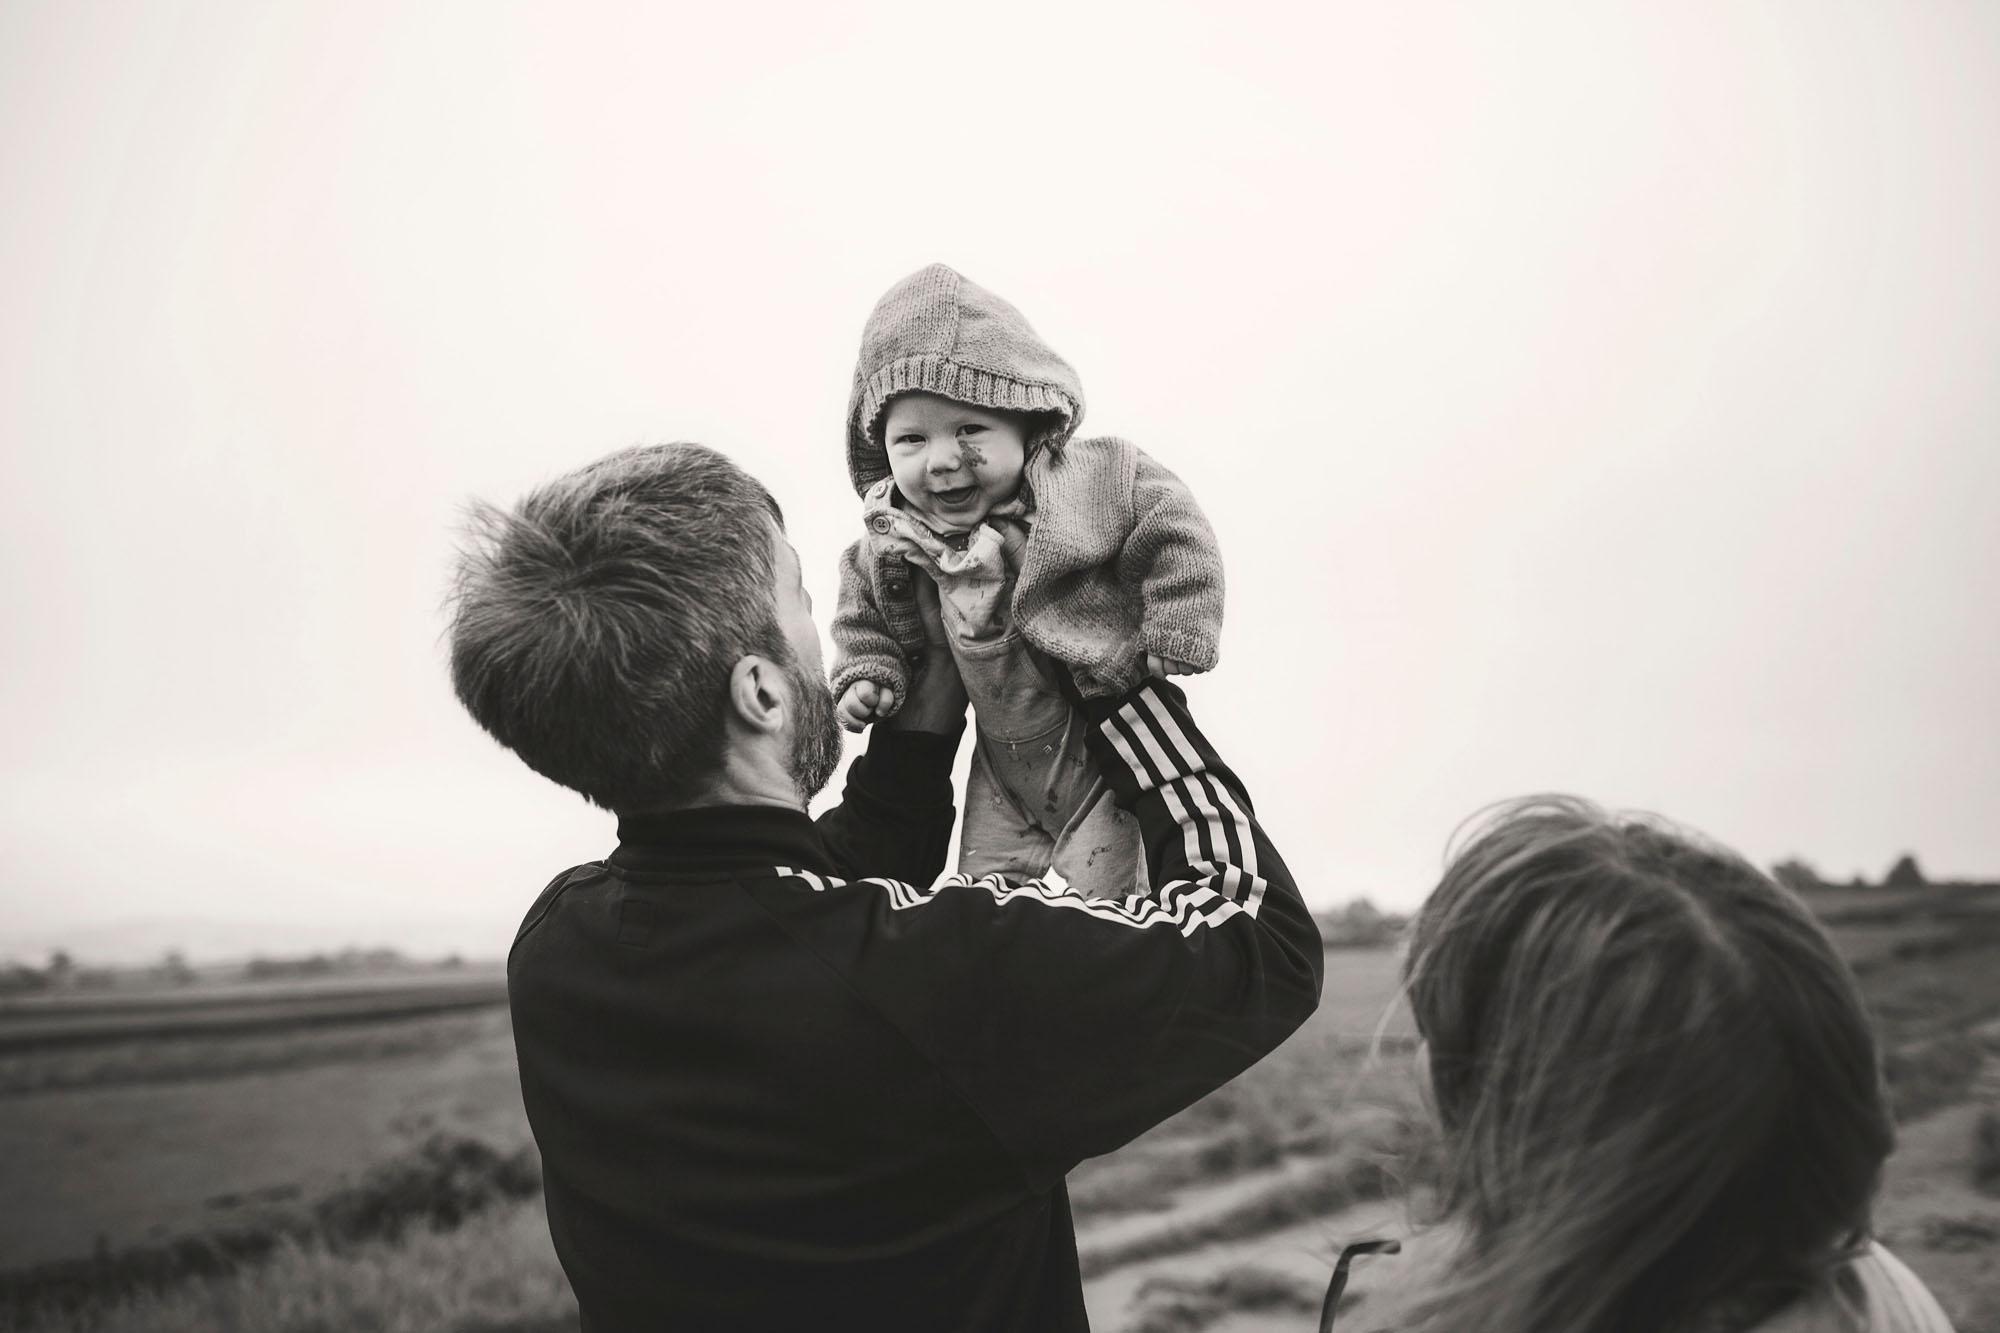 Otley Leeds family photography